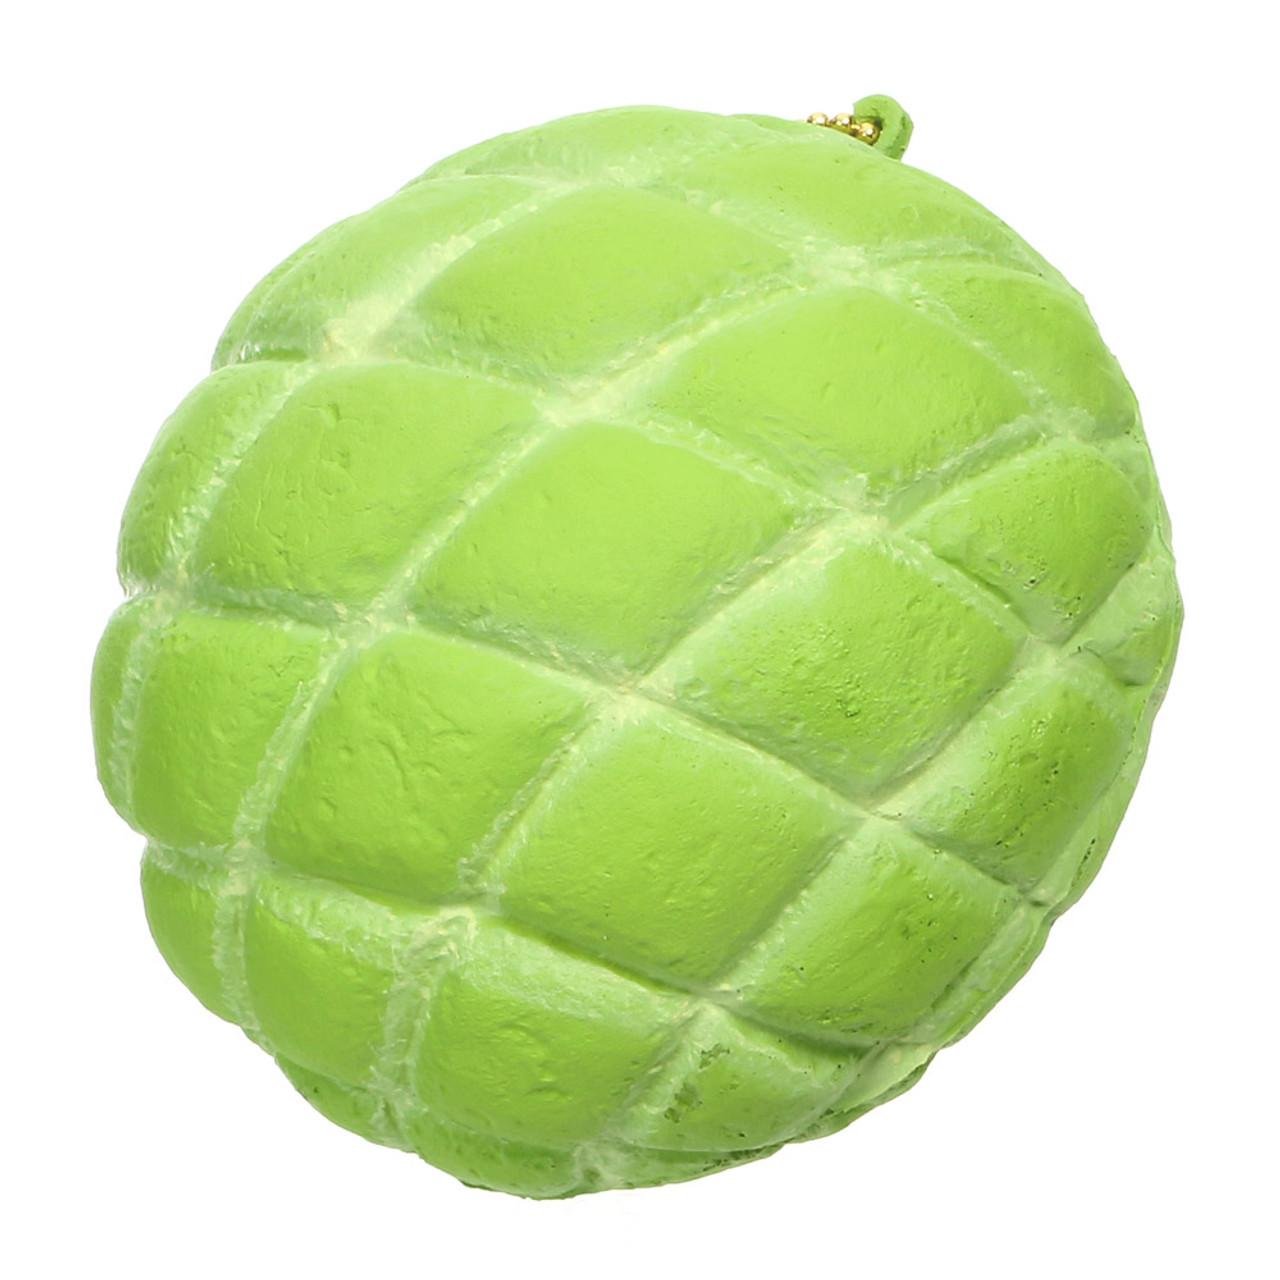 Café De N Green Cantaloupe Melonpan Squishy Toys Charms ( 45 Degree Angle )